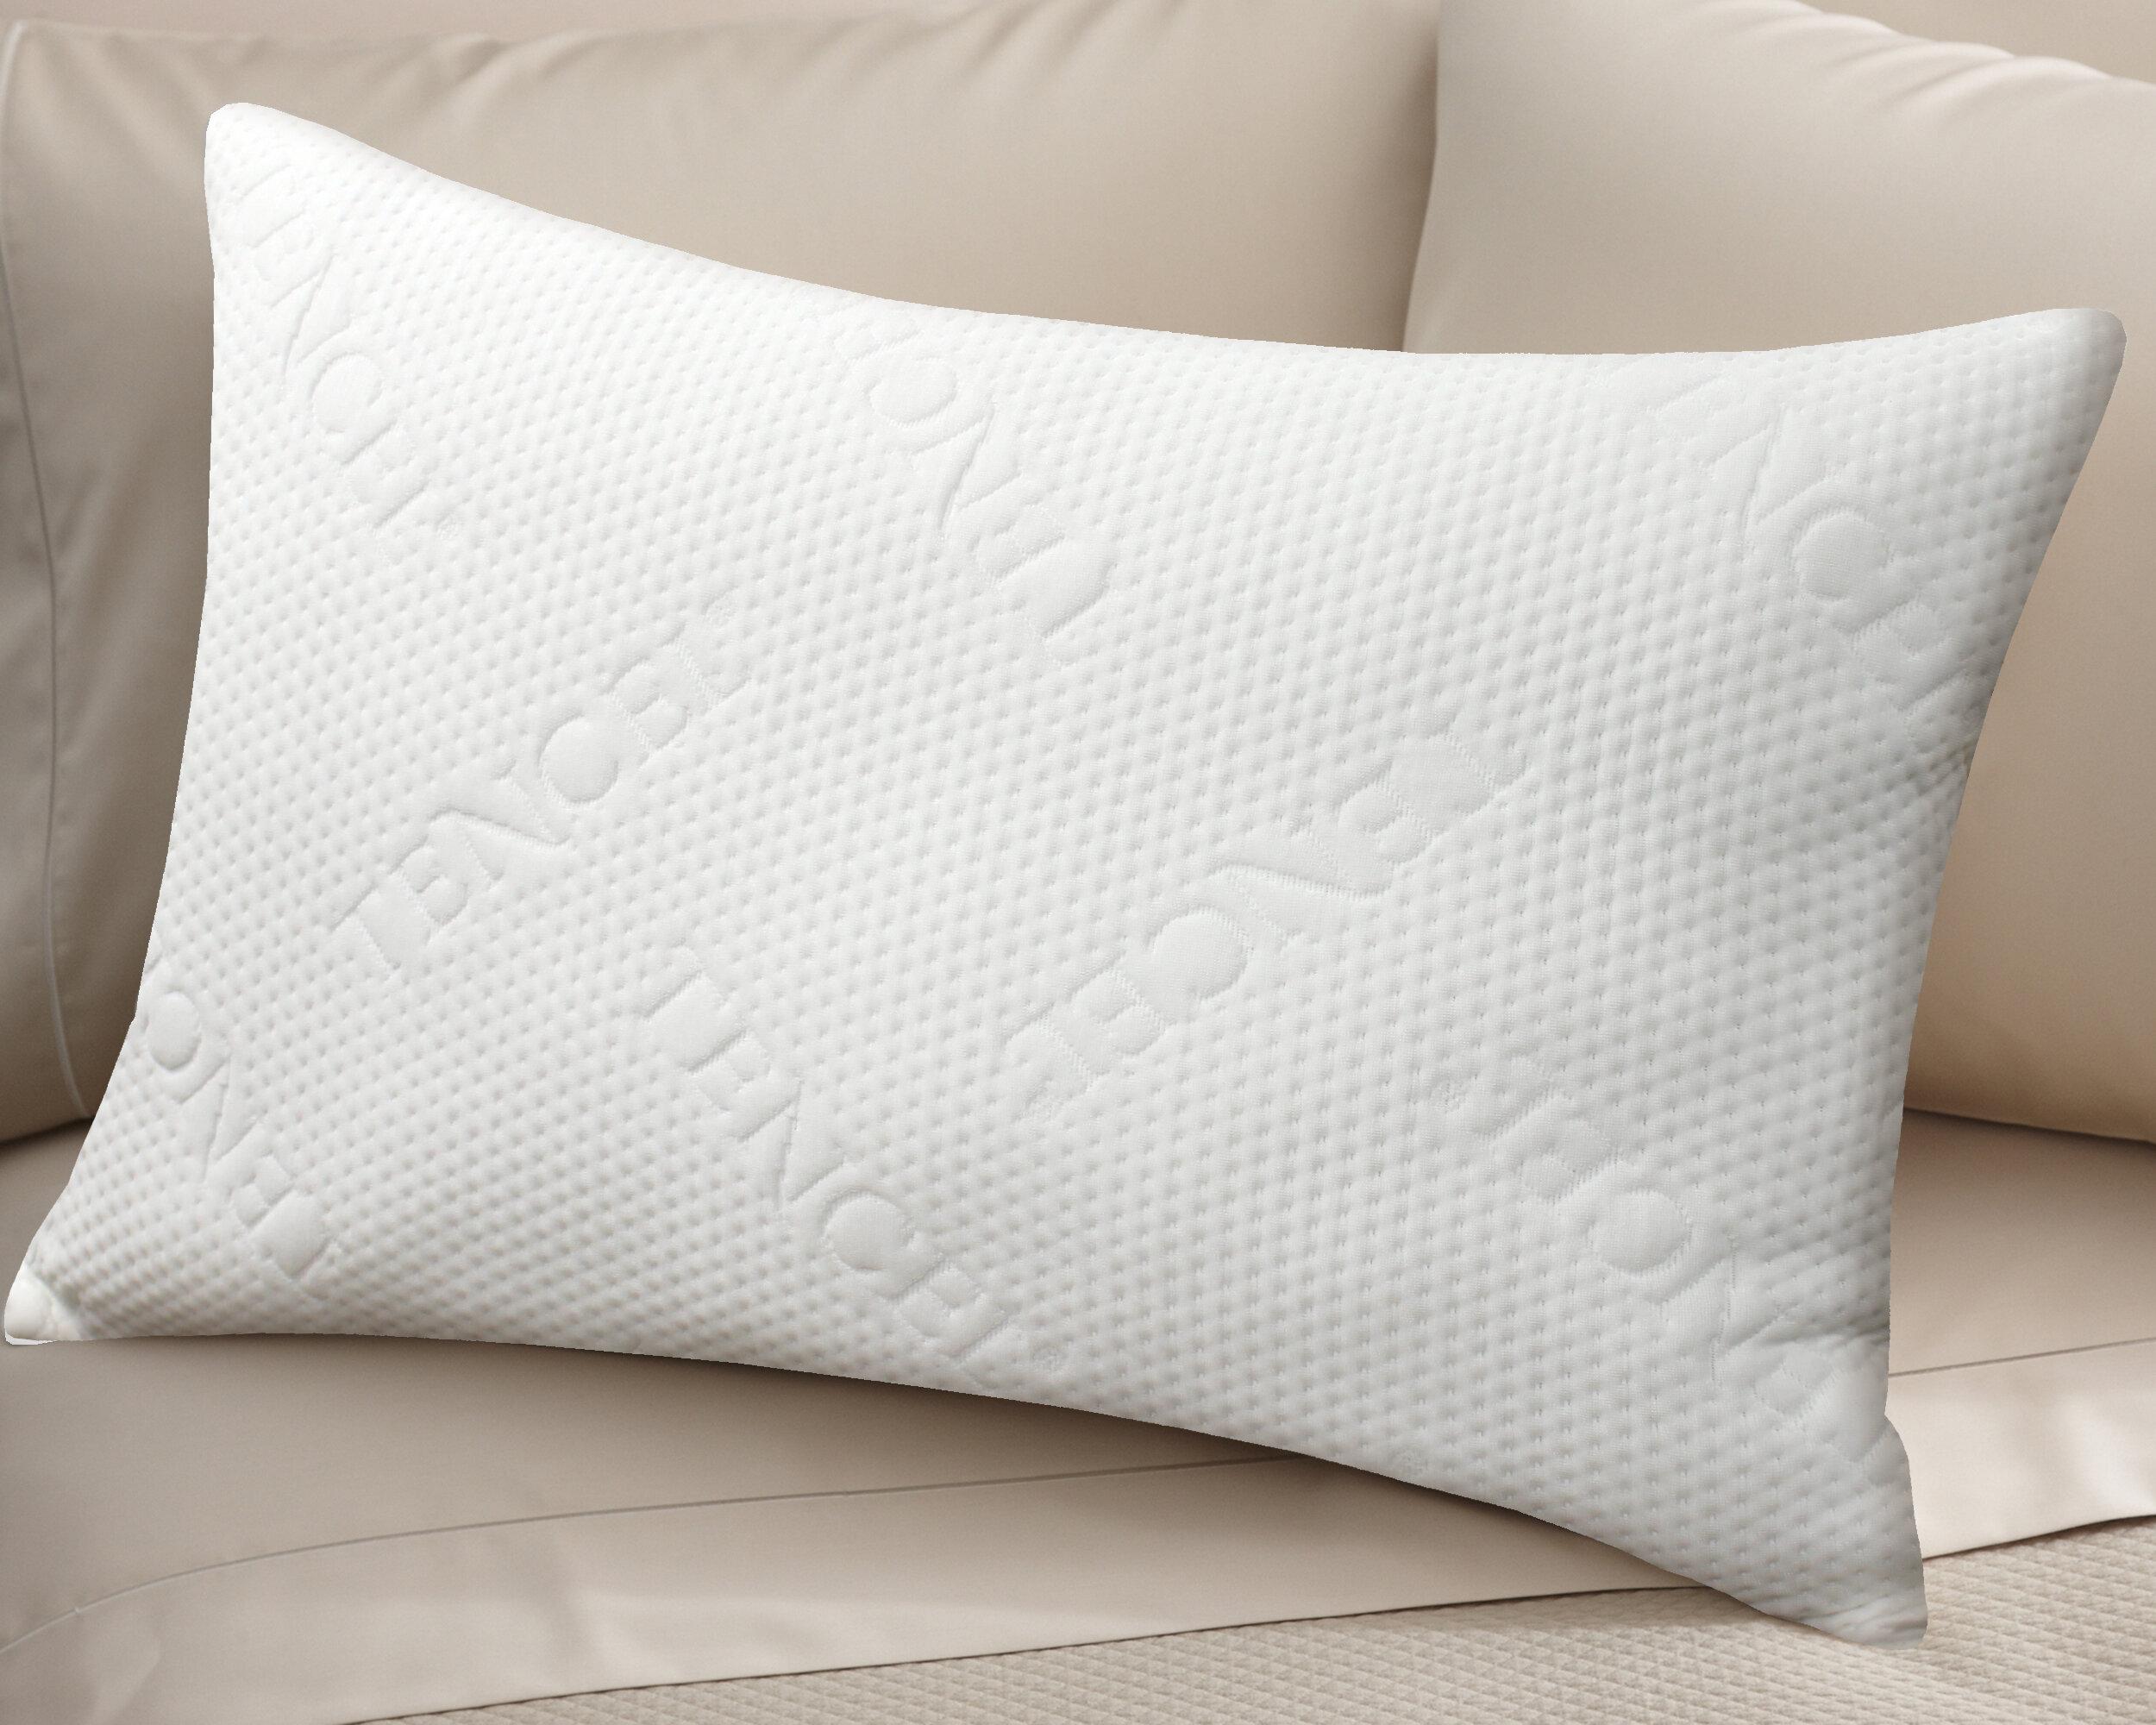 Alwyn Home Davison Tencel Jacquard Medium Polyester Bed Pillow Reviews Wayfair